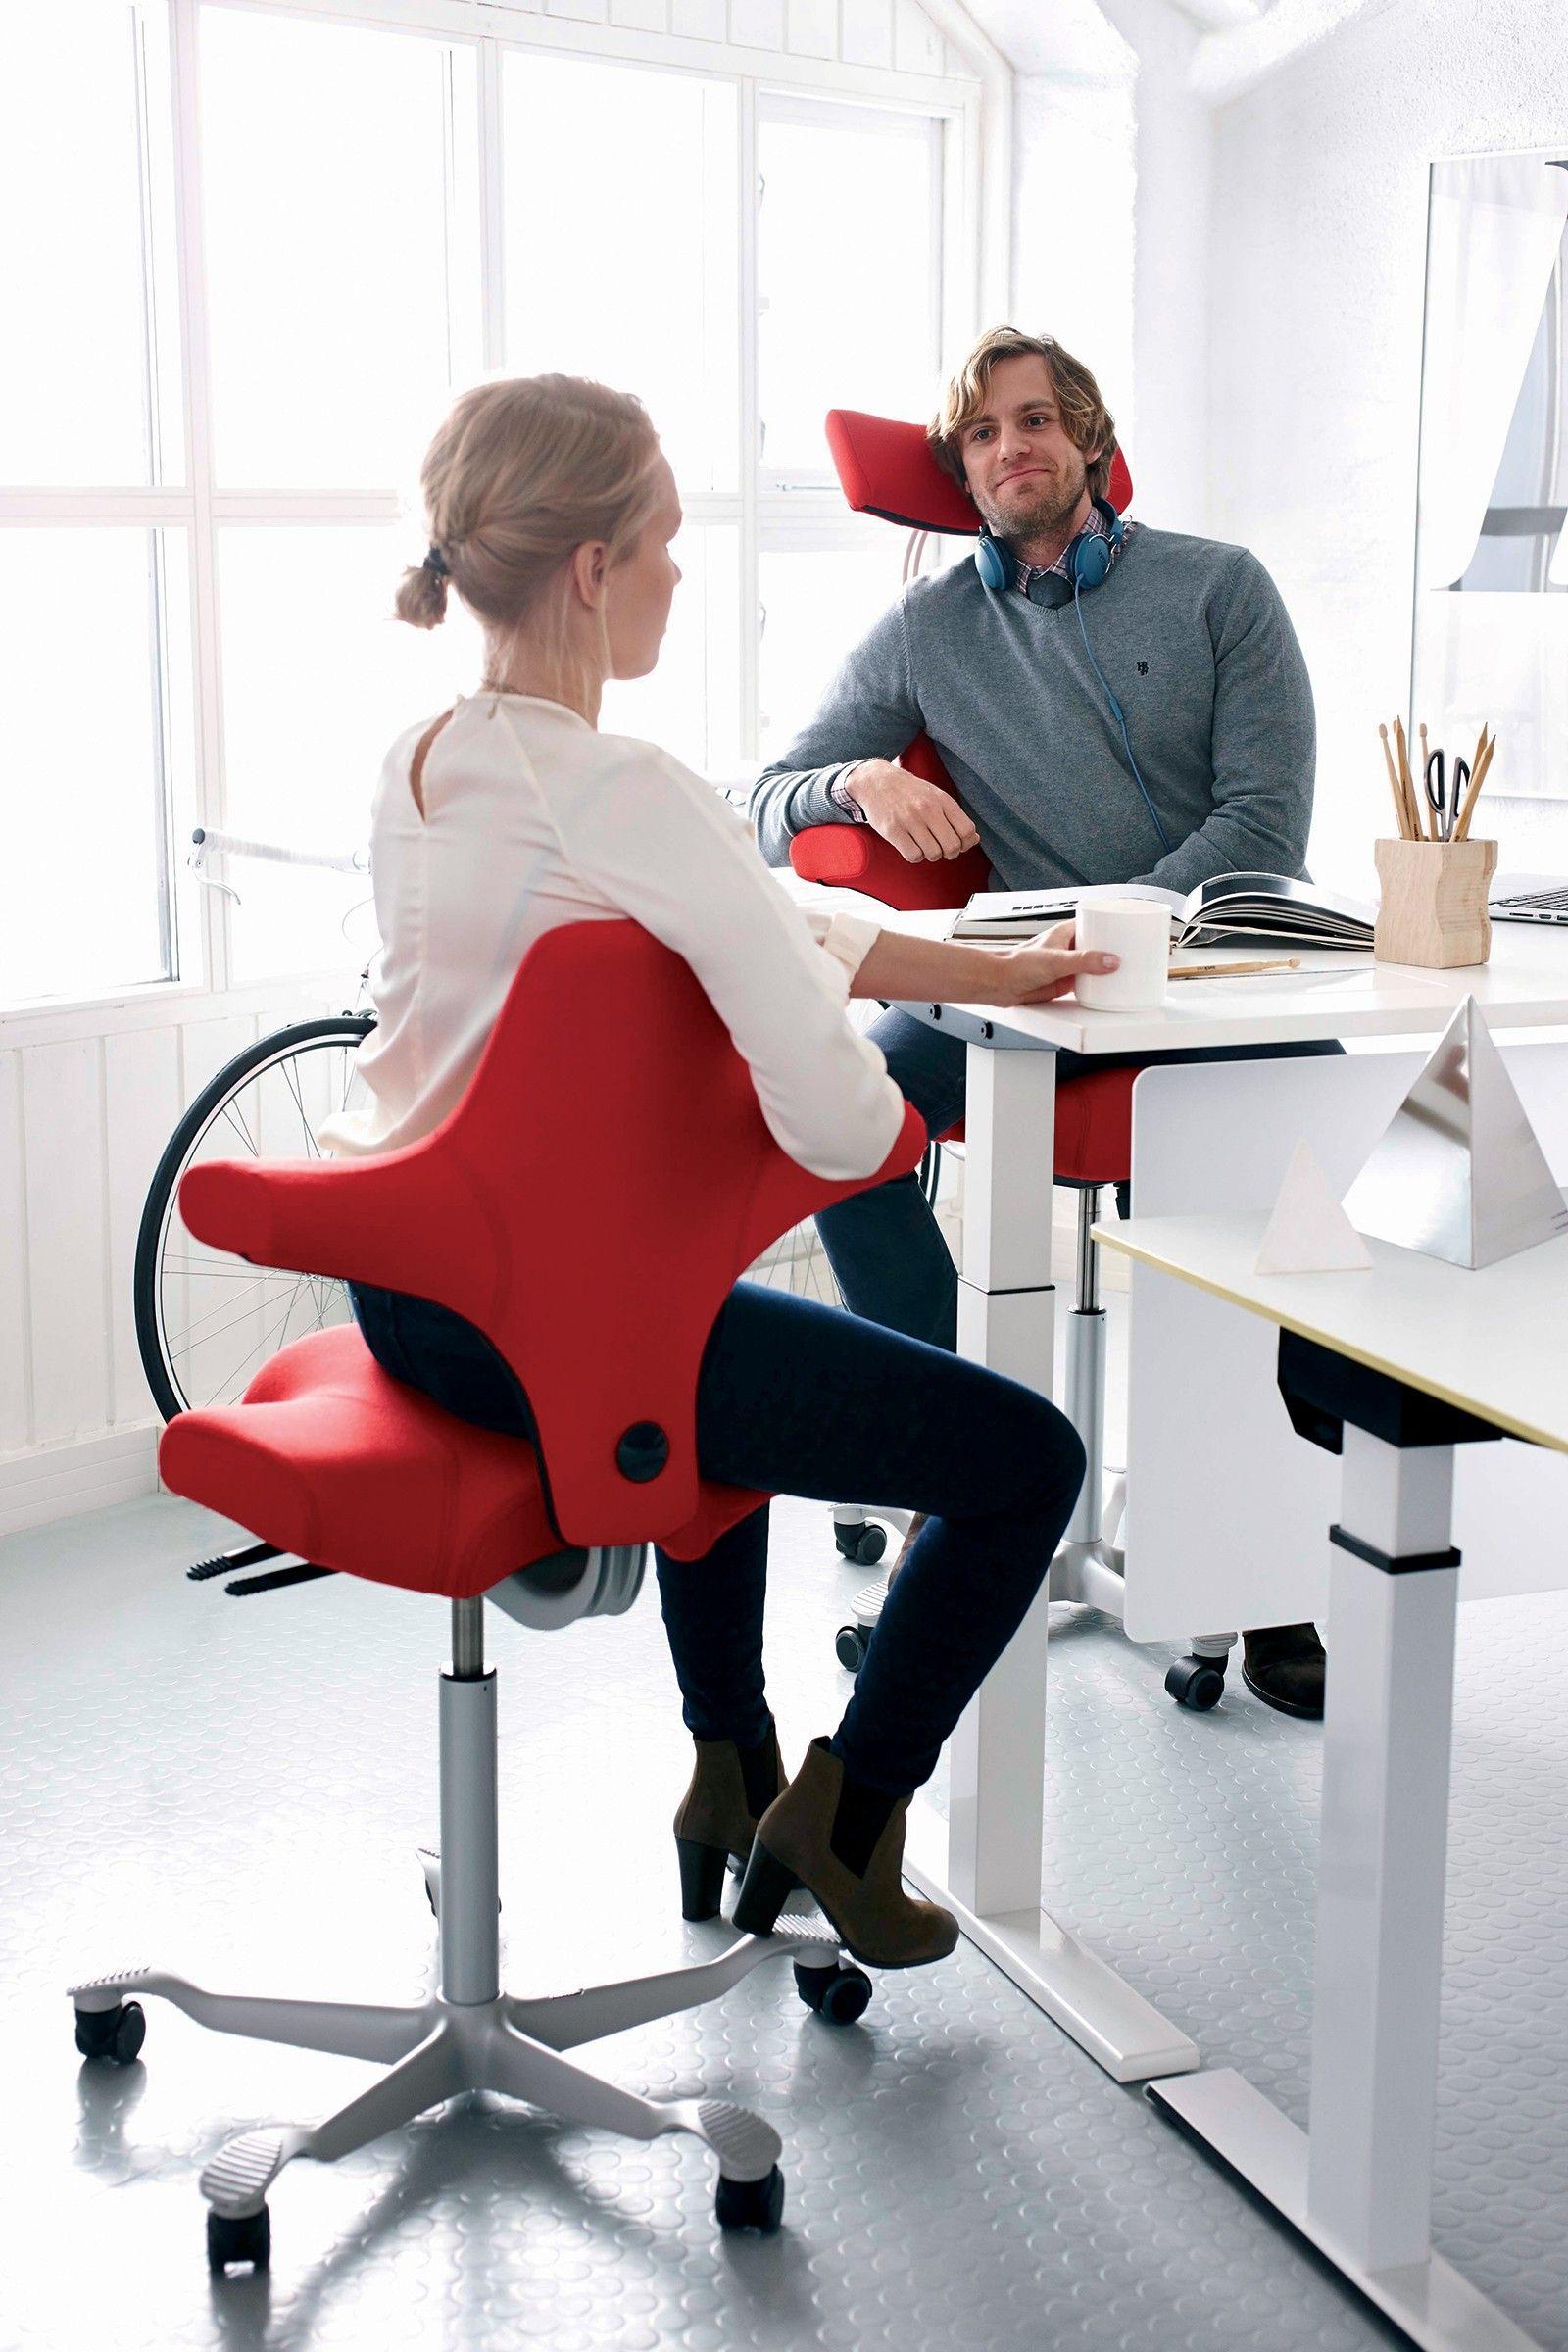 hag posture chair art deco saddle seat headrest capisco h8107 office ergonomics